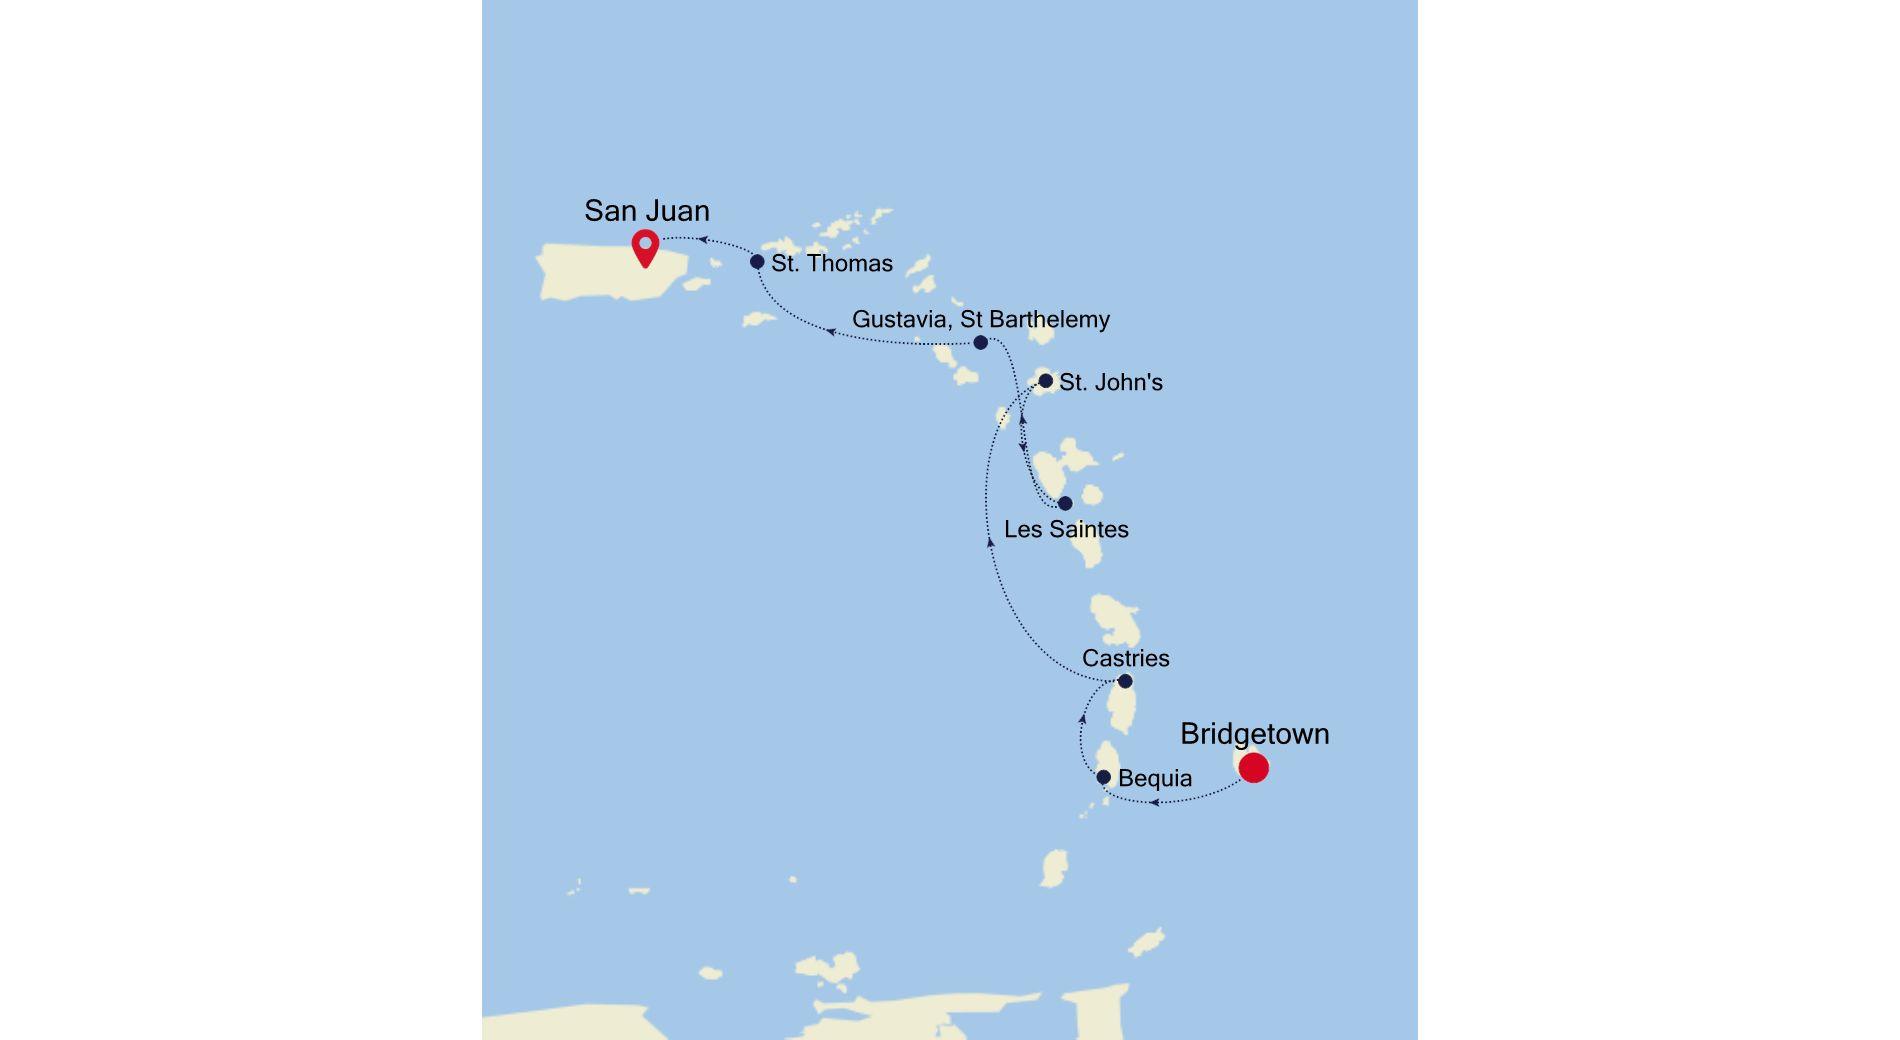 2909 - Bridgetown a San Juan